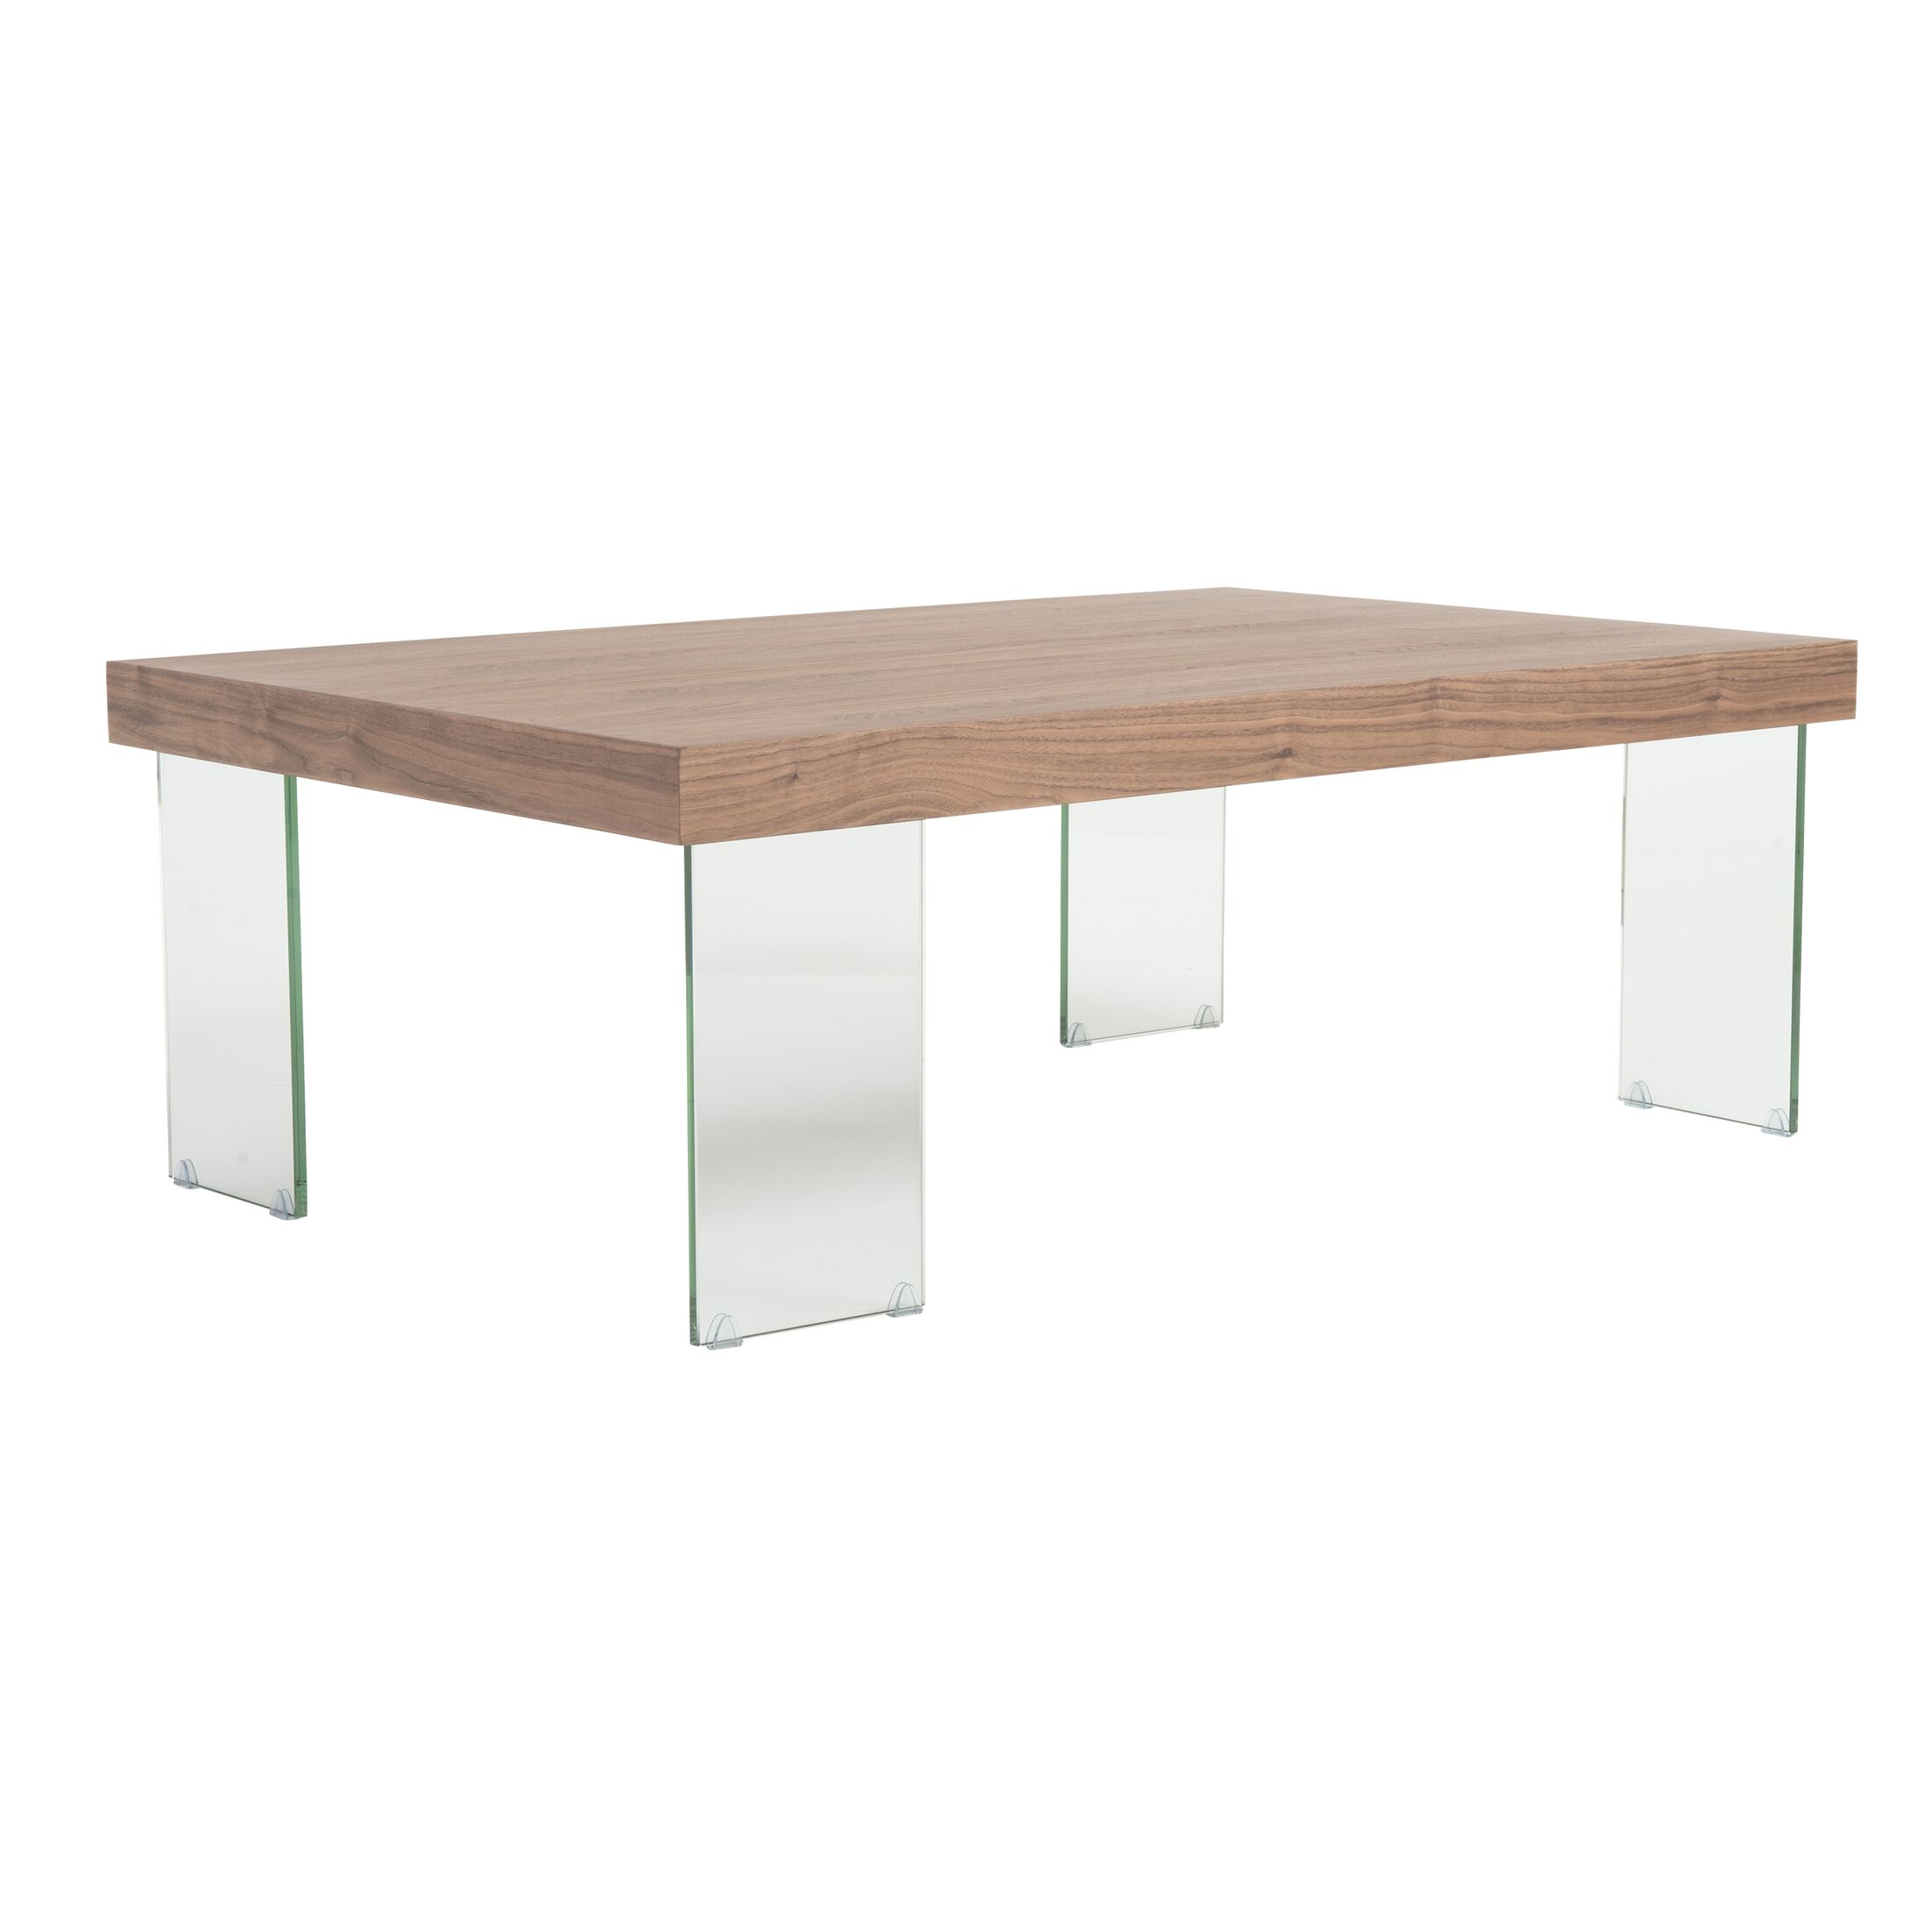 Helle Coffee Table